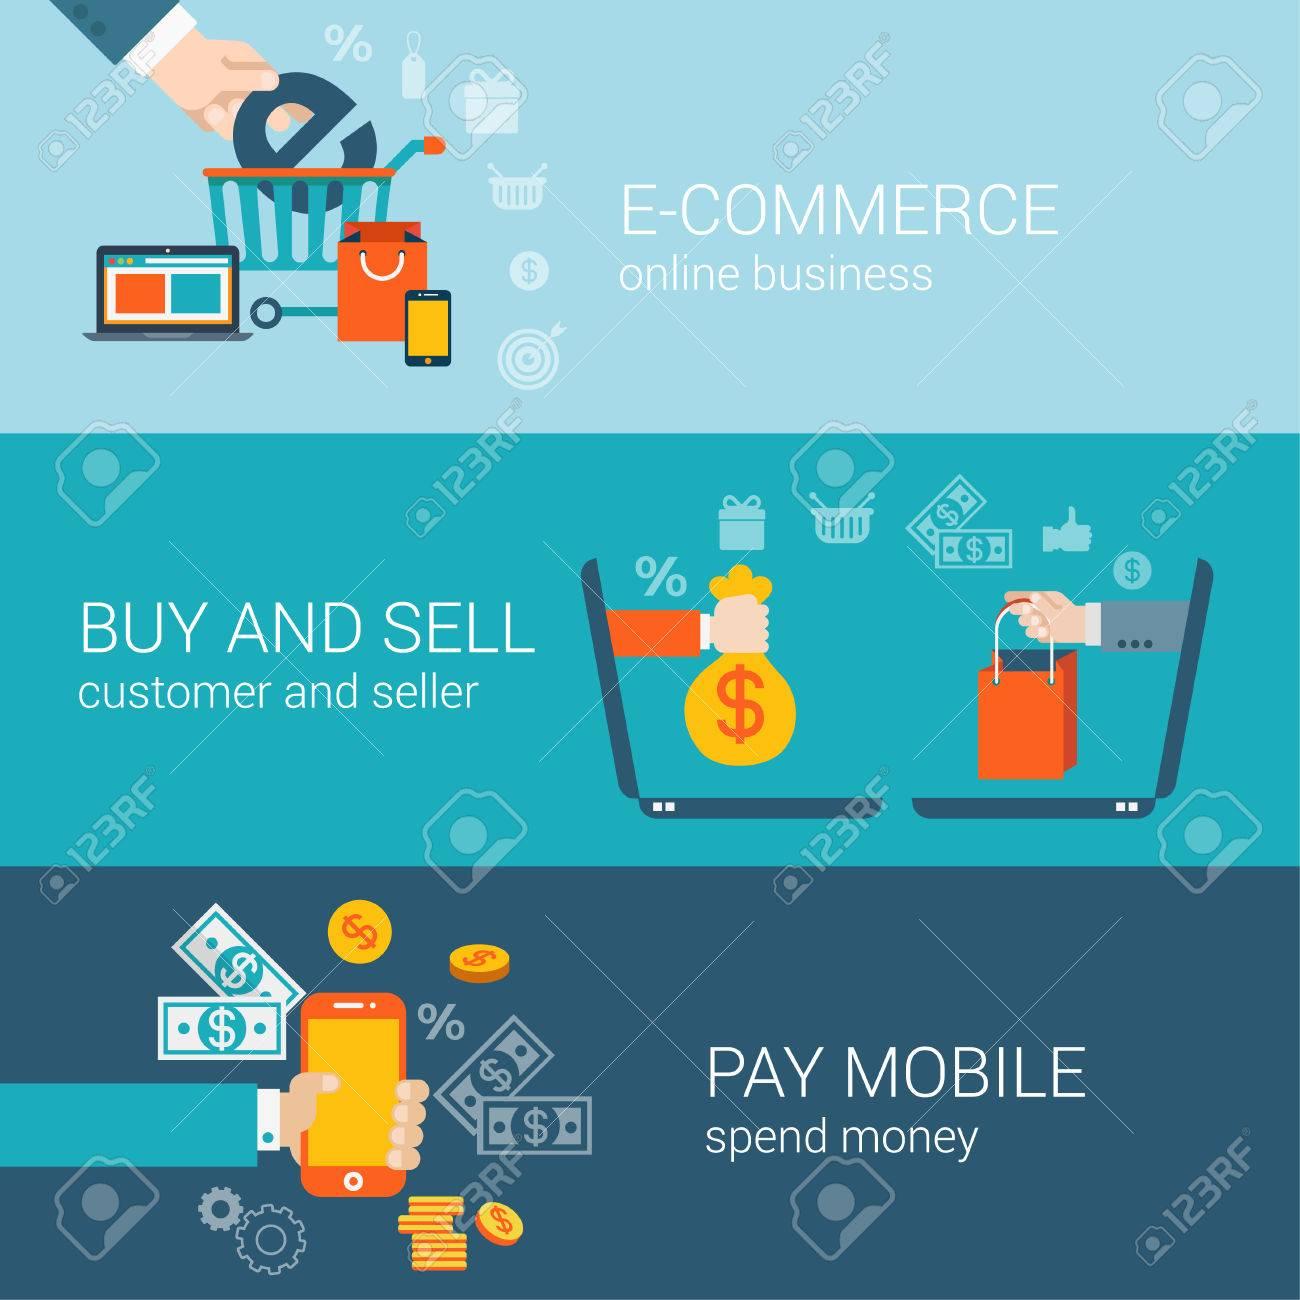 Wohnung Stil Mobile Online E Commerce Kaufen Zahlen Infografik